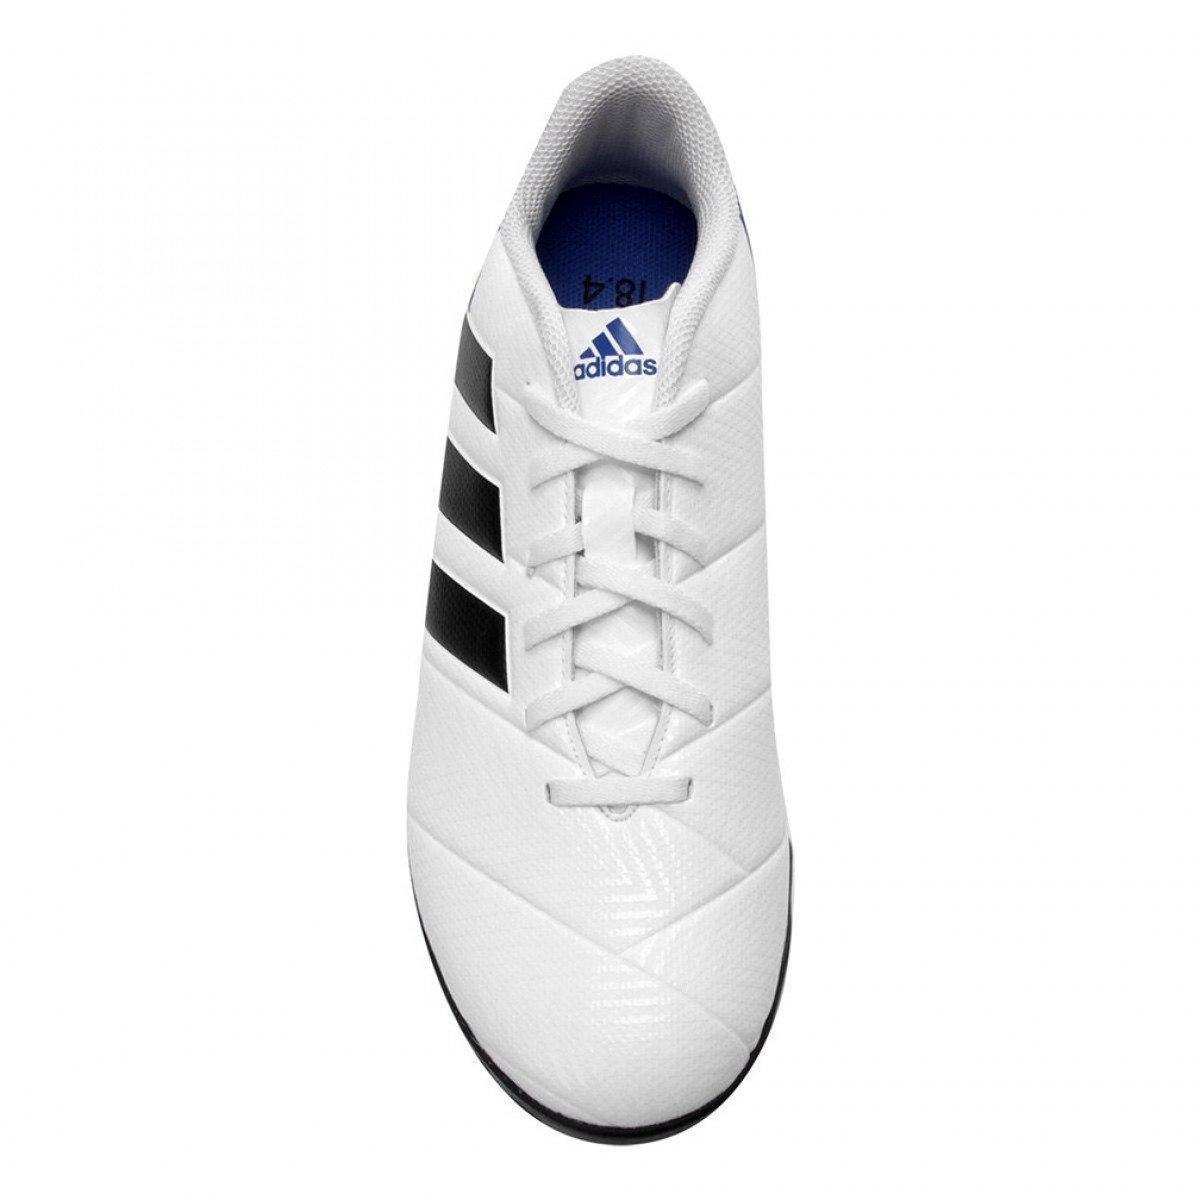 ... Chuteira Society Adidas Nemeziz Messi Tango 18.4 - Branco e Azul ... bf0fed9868c4a